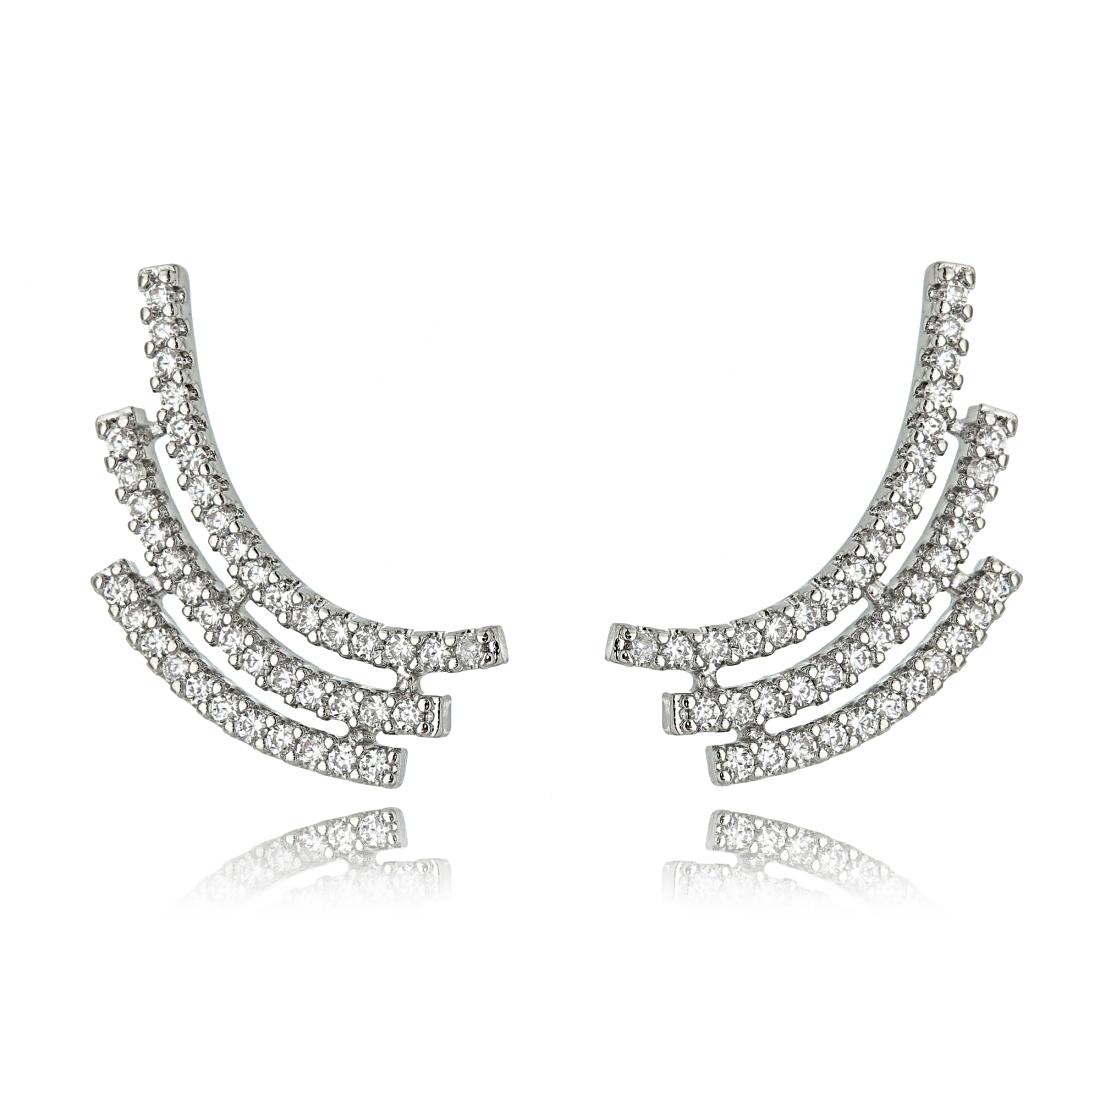 Ear Cuff Fashion de Zircônia Cristal Ródio Branco Semijoia Online  - Soloyou